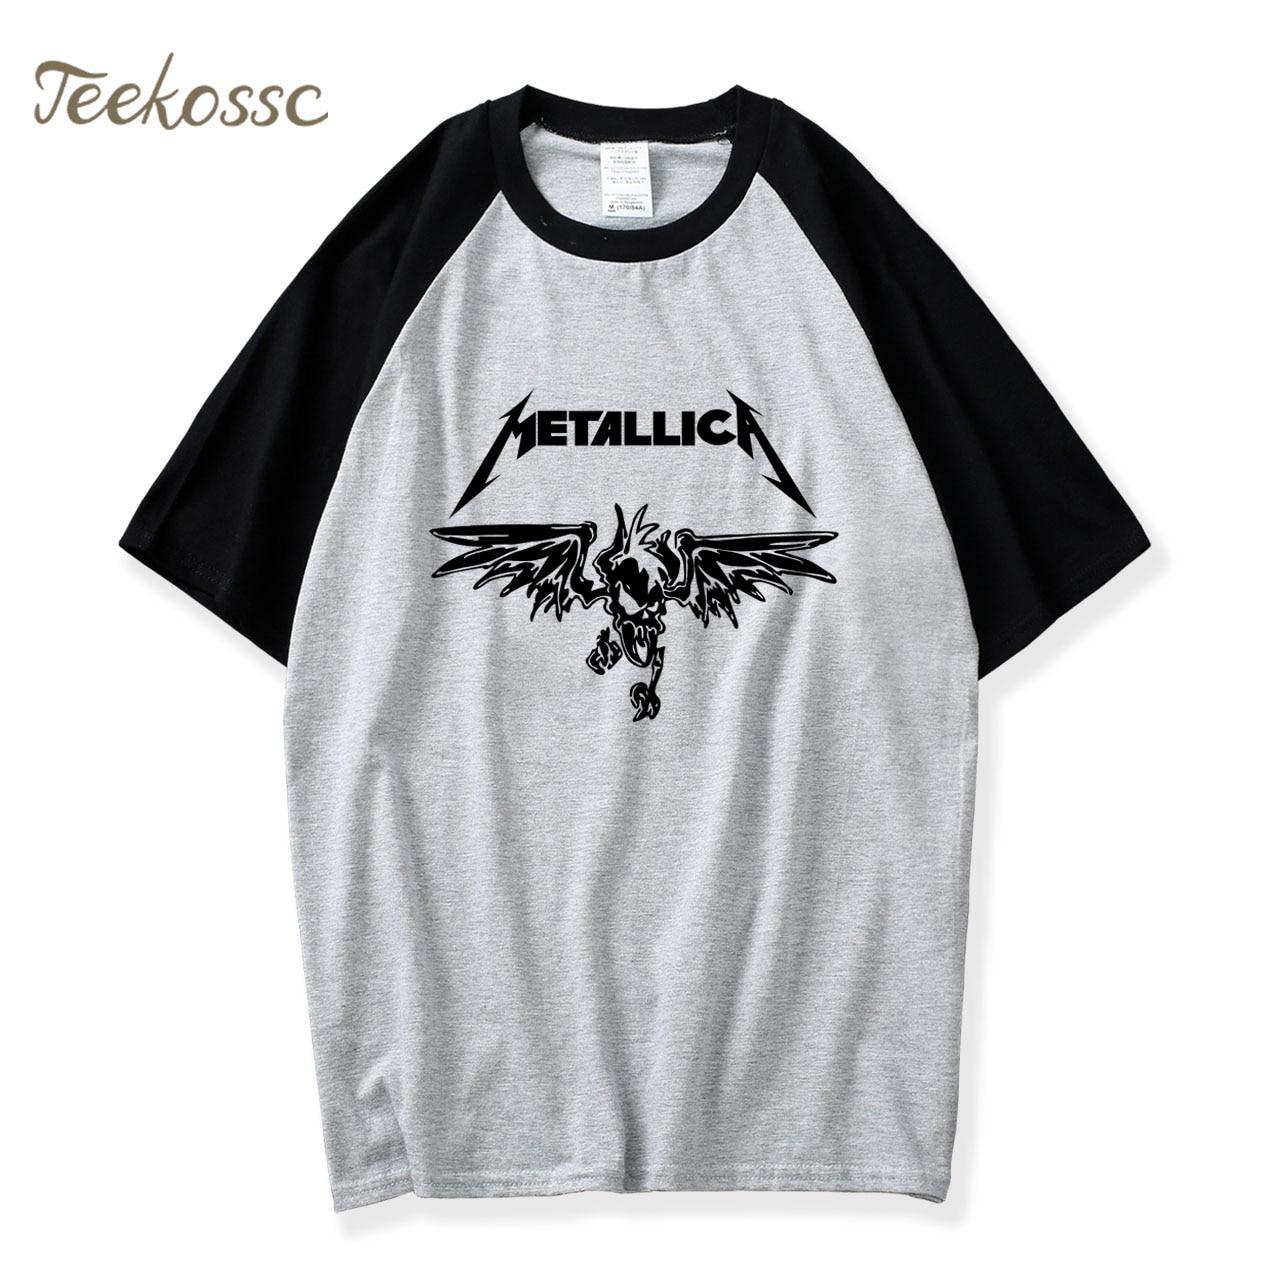 Heavy Metal Music Tshirts Hot Summer Raglan Sleeve Punk Rock Cotton T-Shirt Casual Shirt Hip Hop T Shirt Mens Fashion For Men